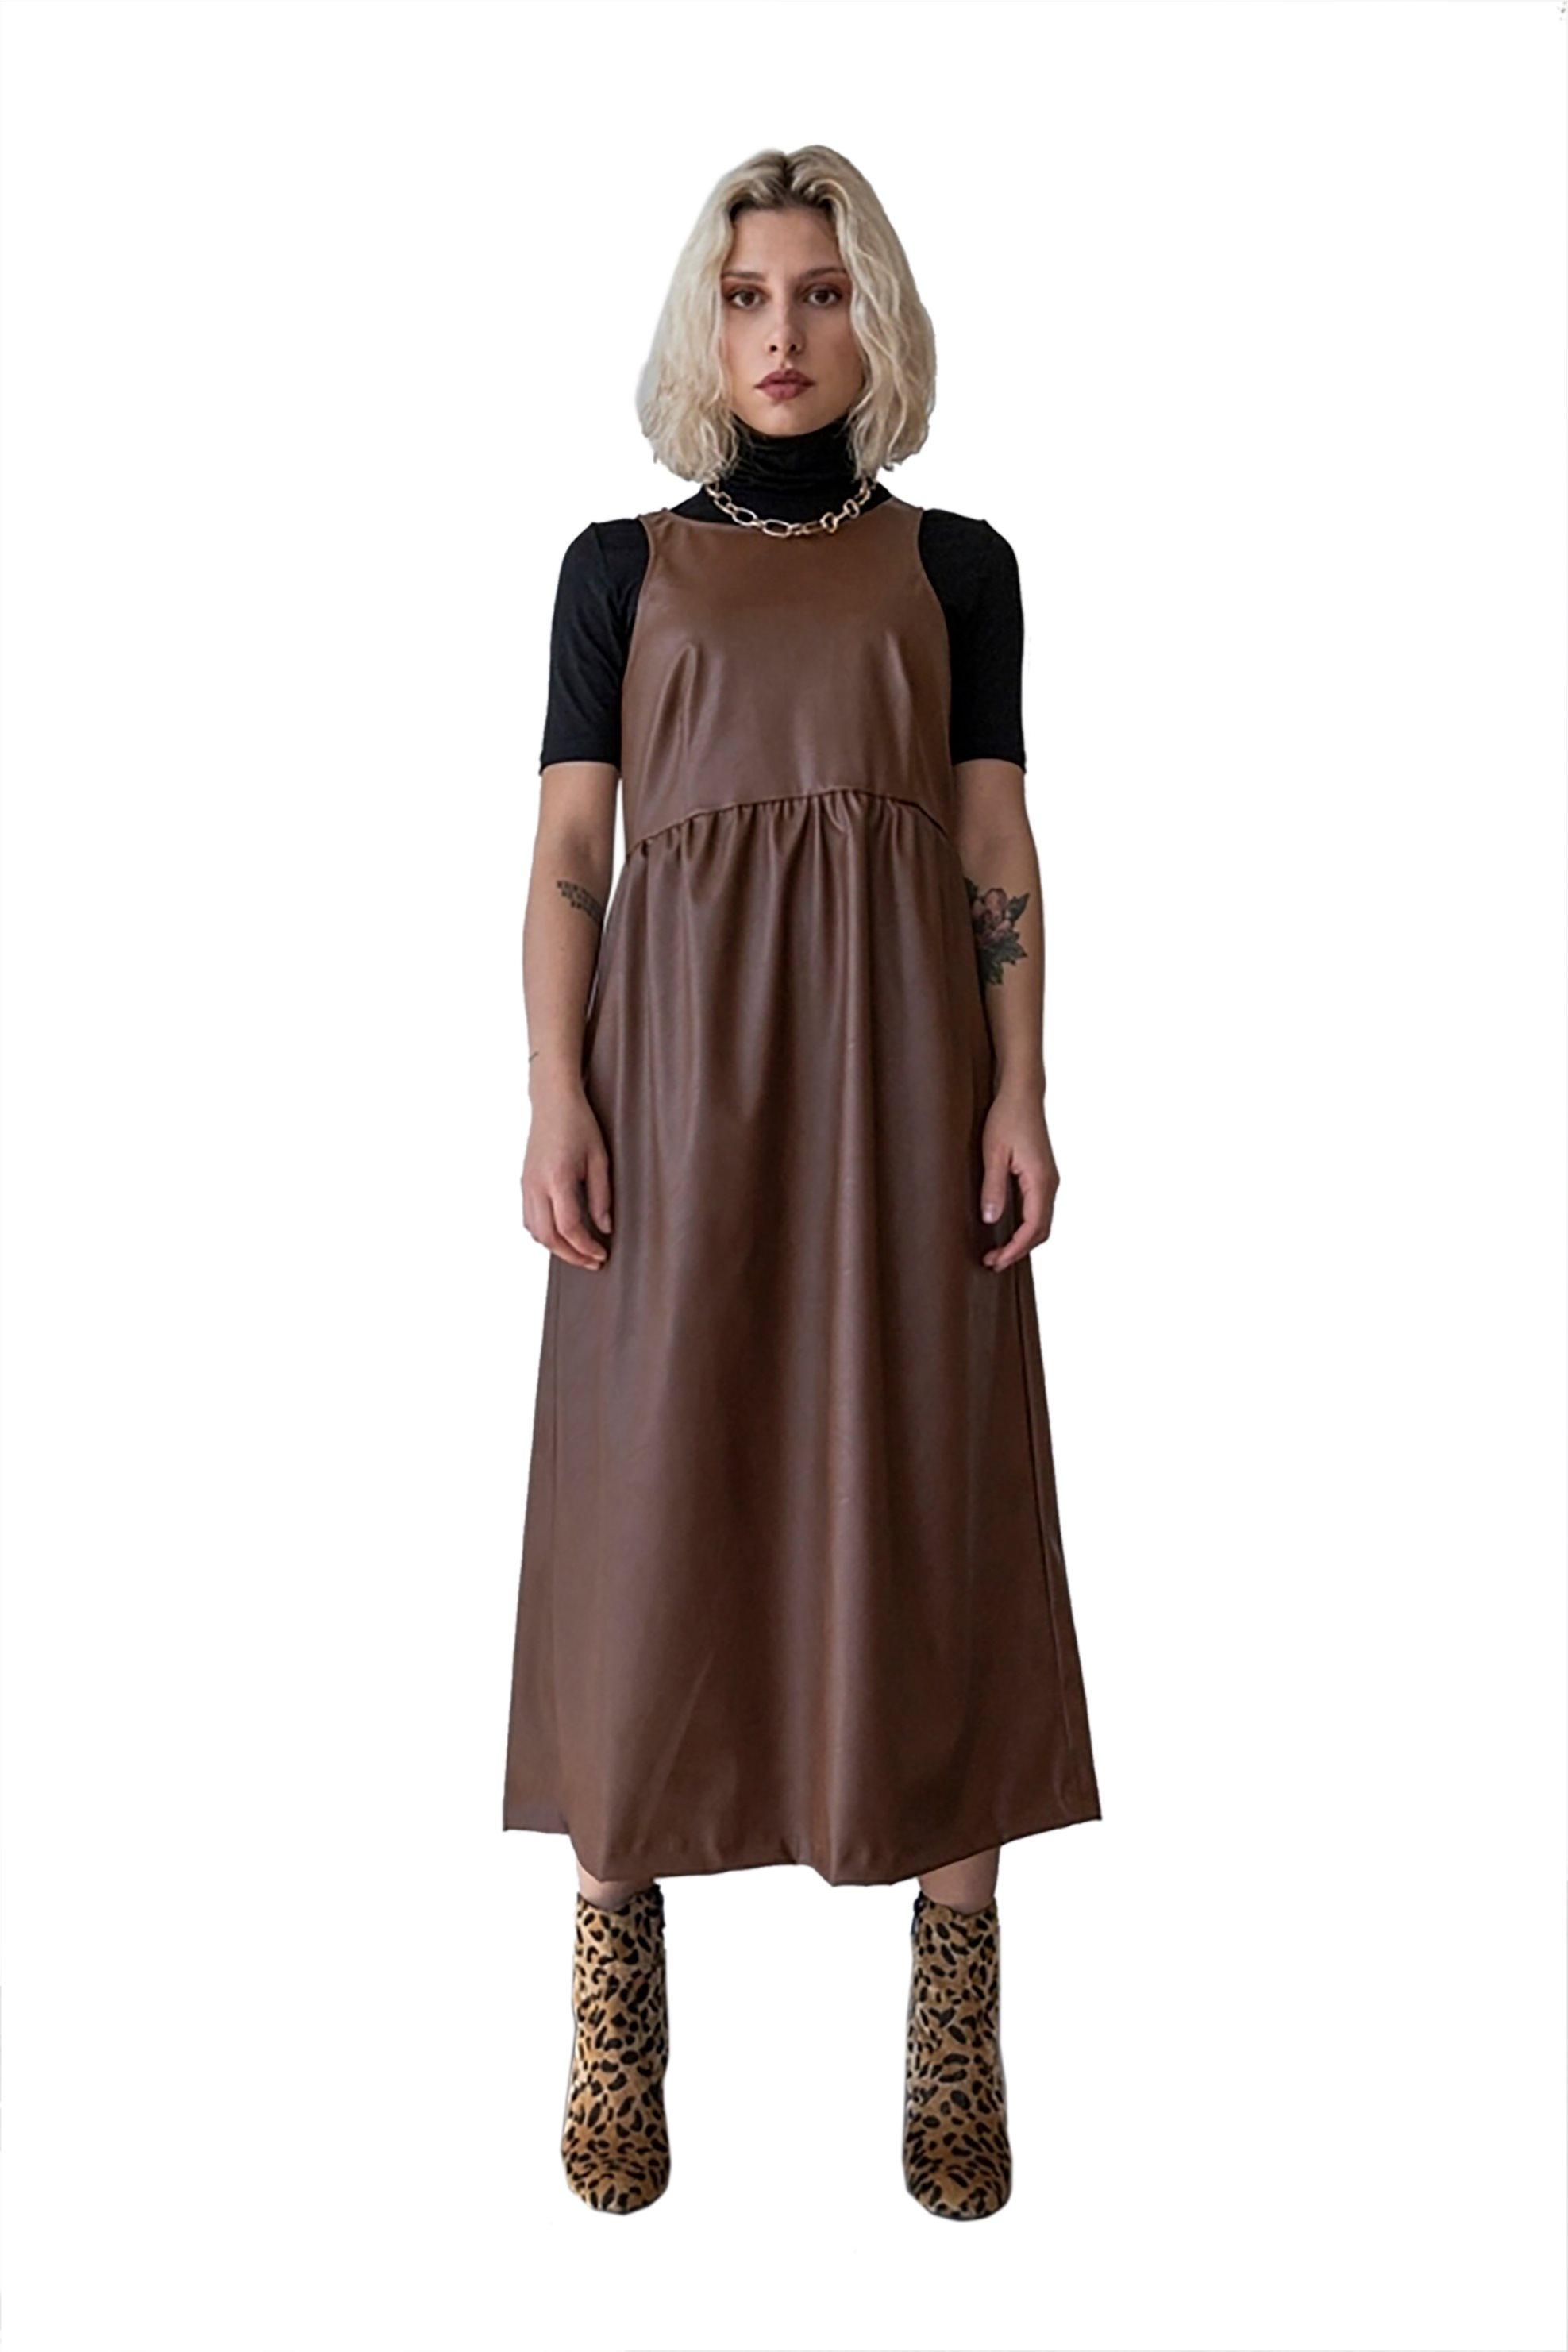 Helmi γυναικείο midi φόρεμα αμάνικο faux leather - 46-05-023 - Ταμπά